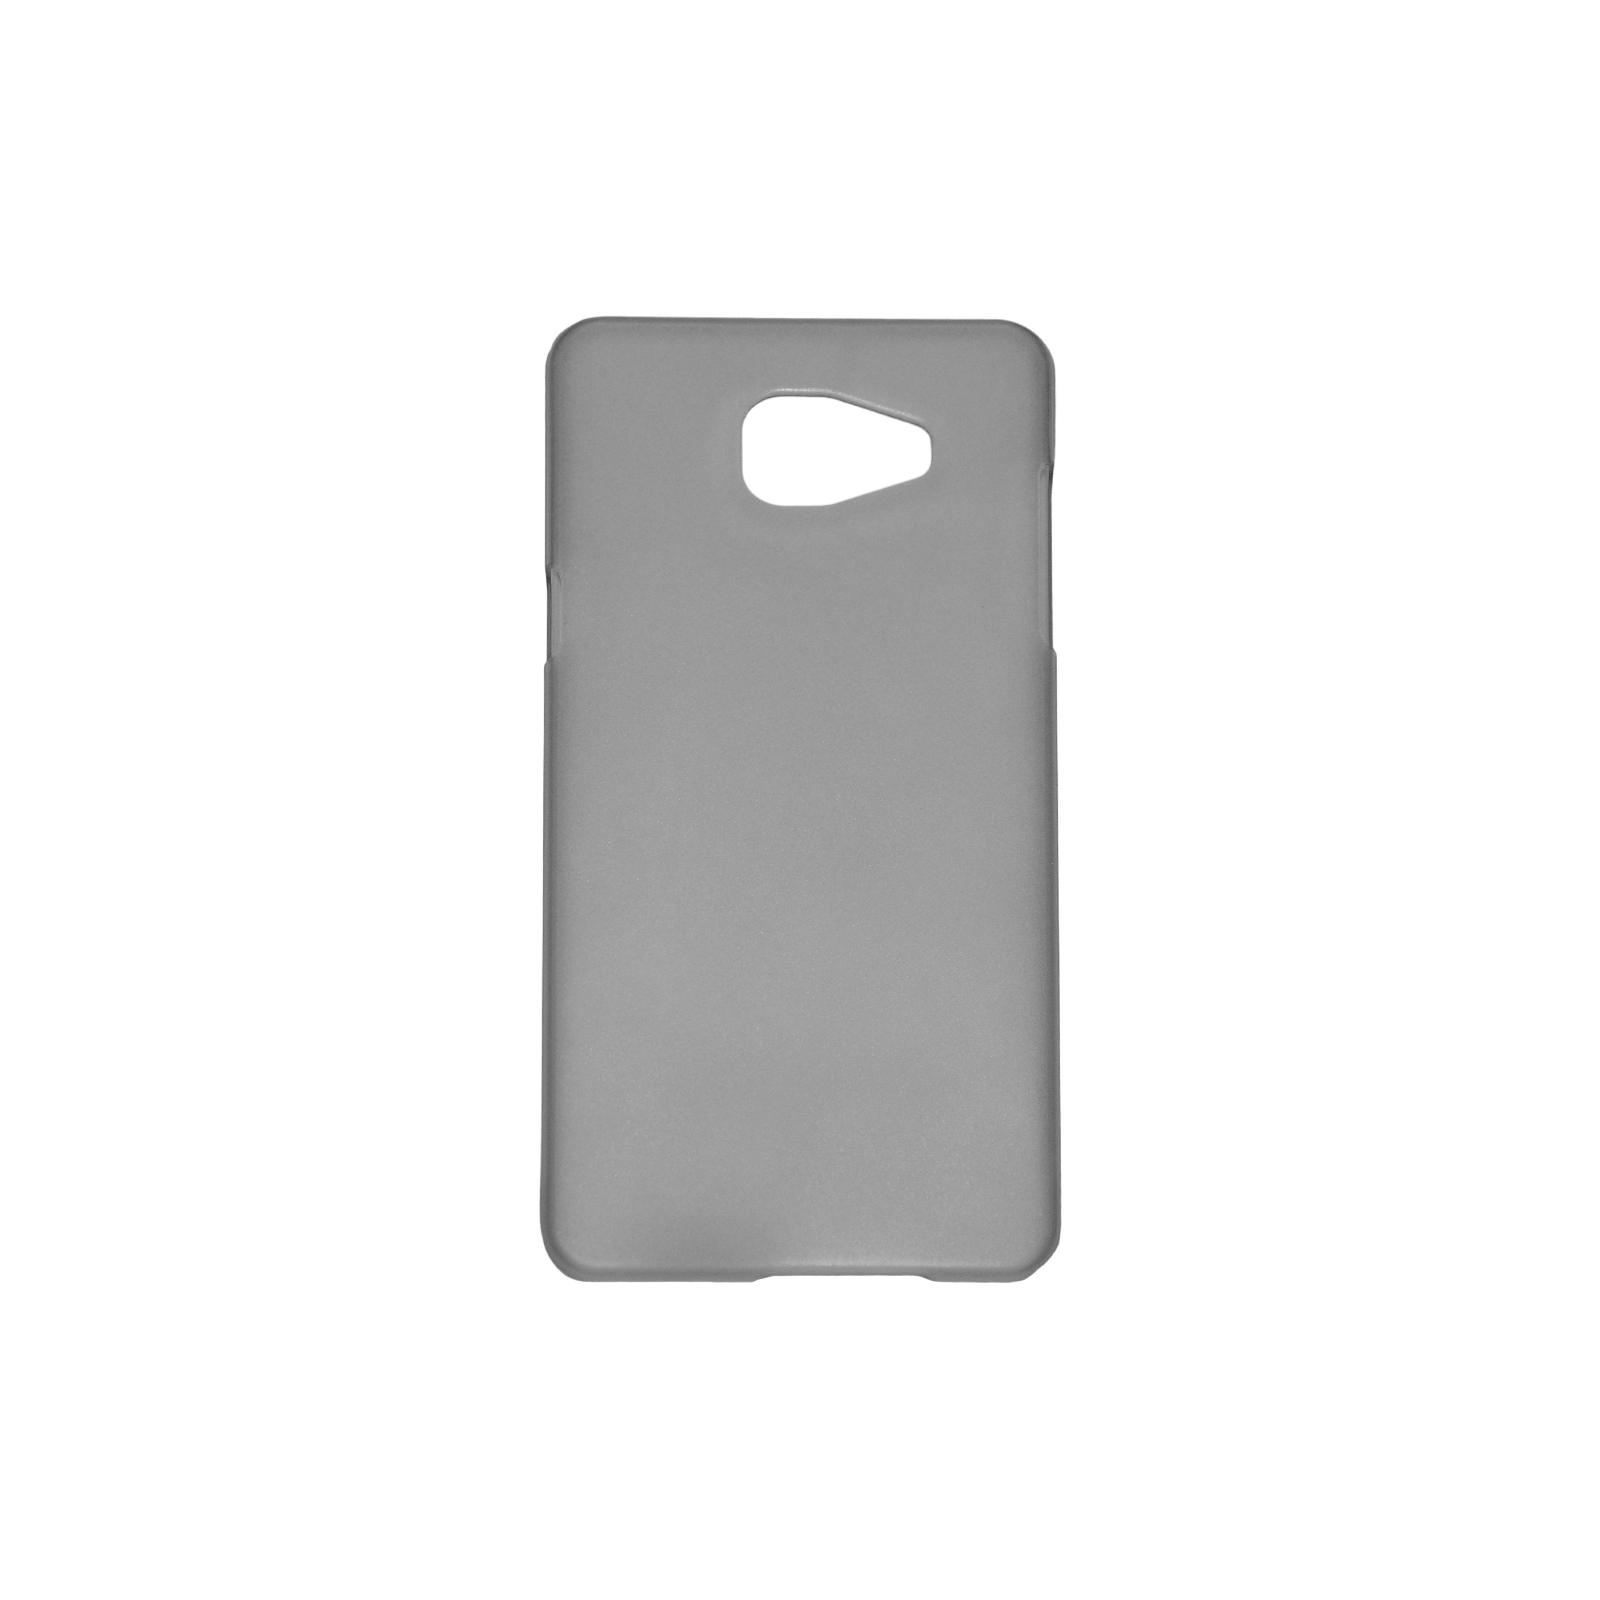 Чехол для моб. телефона Pro-case для Samsung A5 (A510) black (CP-311-BLK)